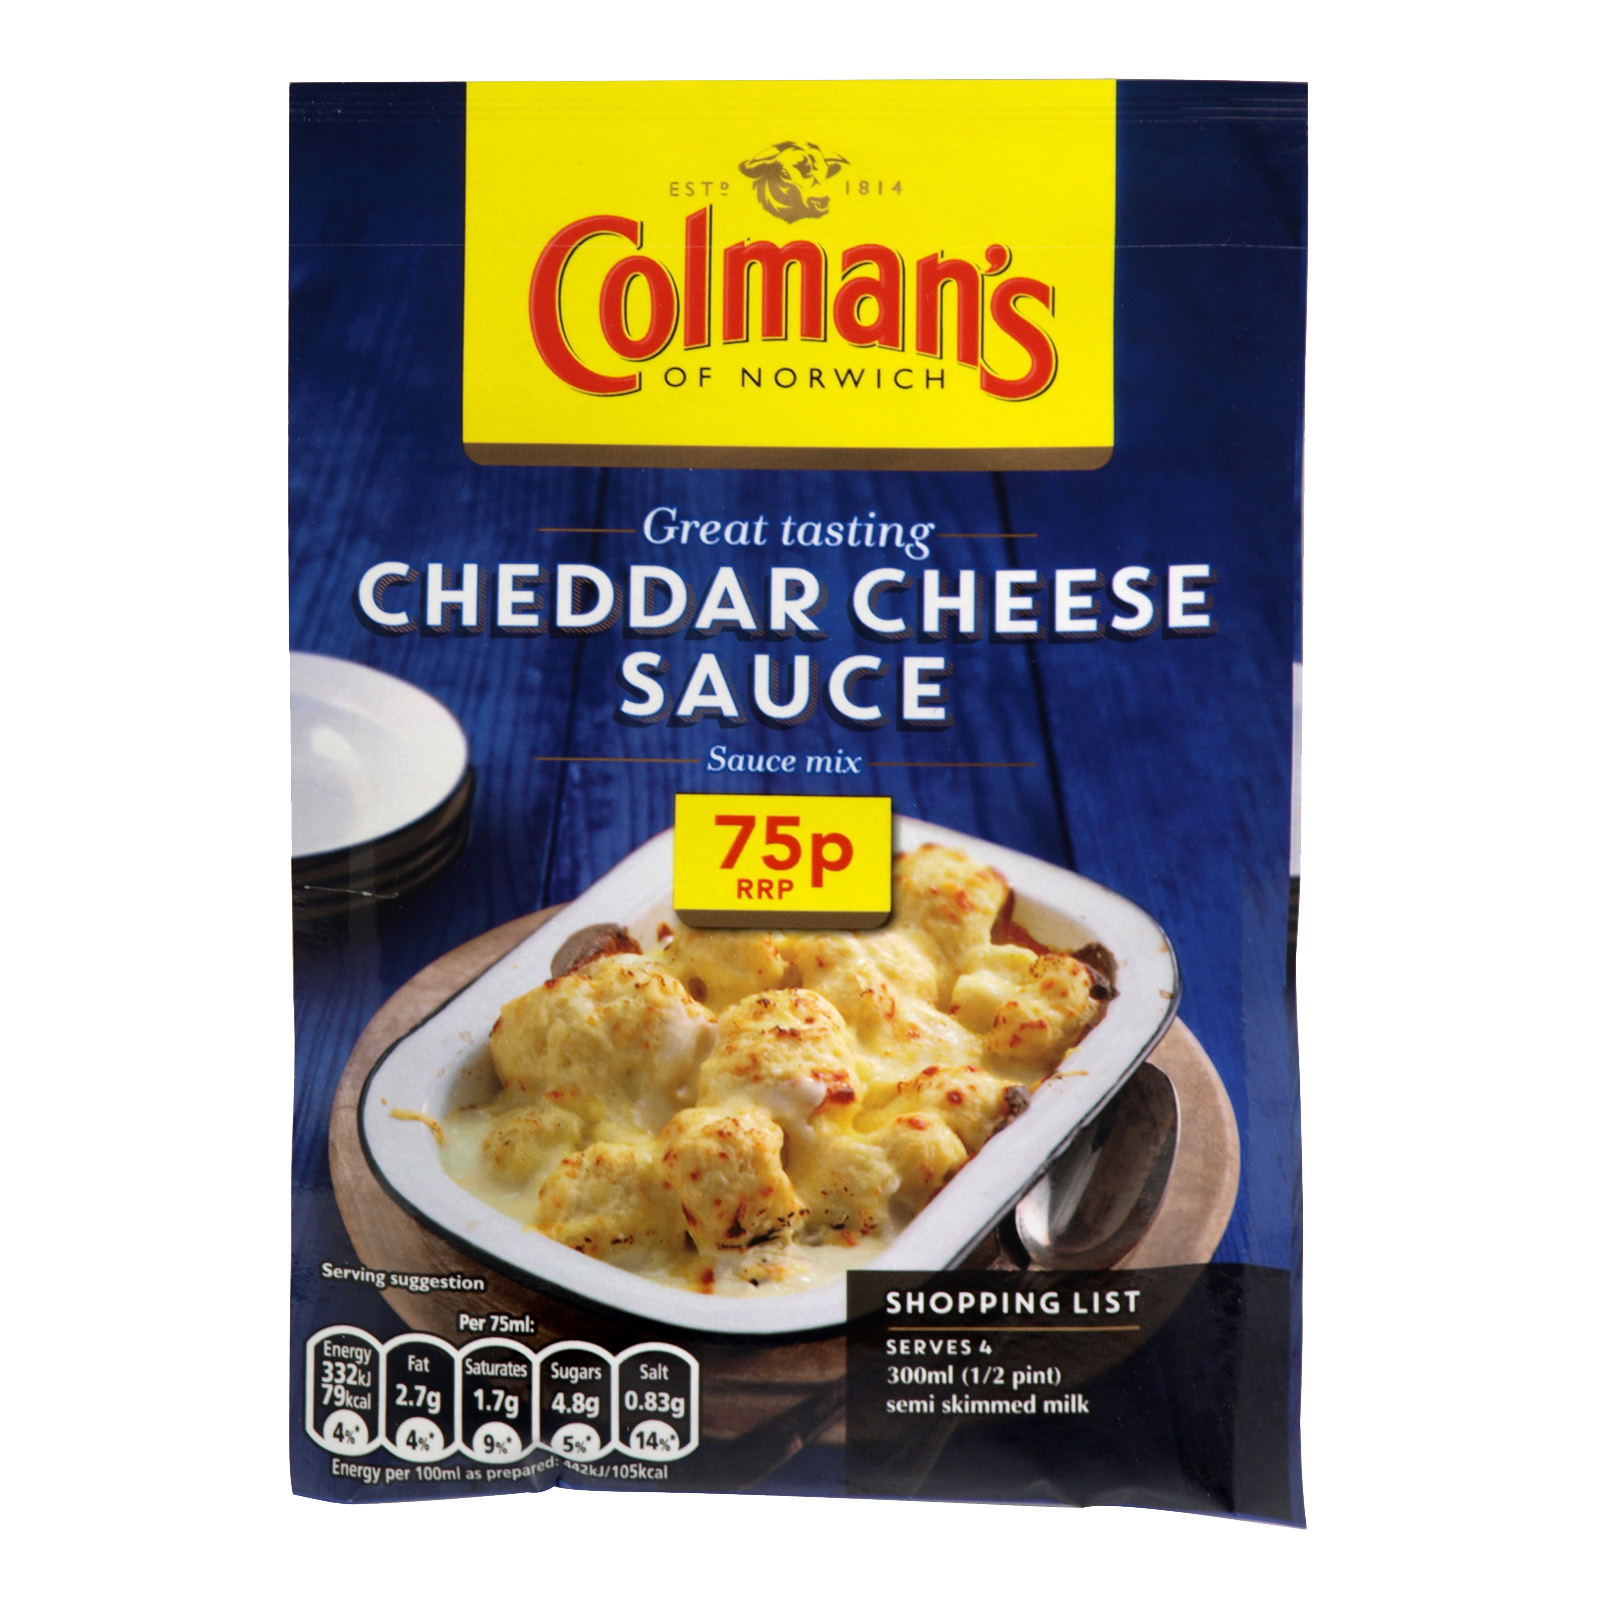 COLMANS CHEDDAR CHEESE SAUCE 40GM PM 0.75P